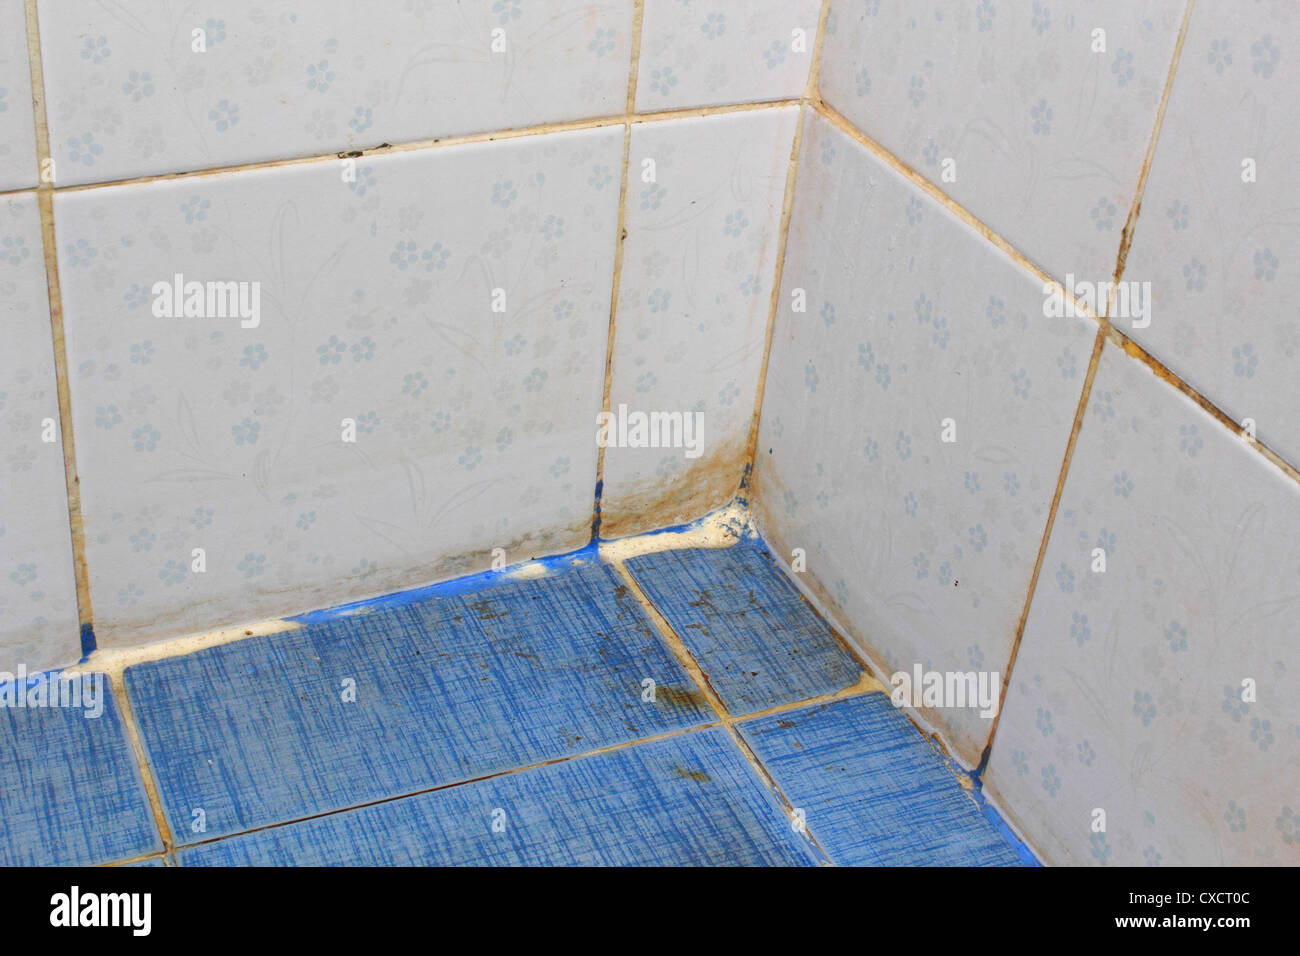 A dirty bathroom - Stock Image